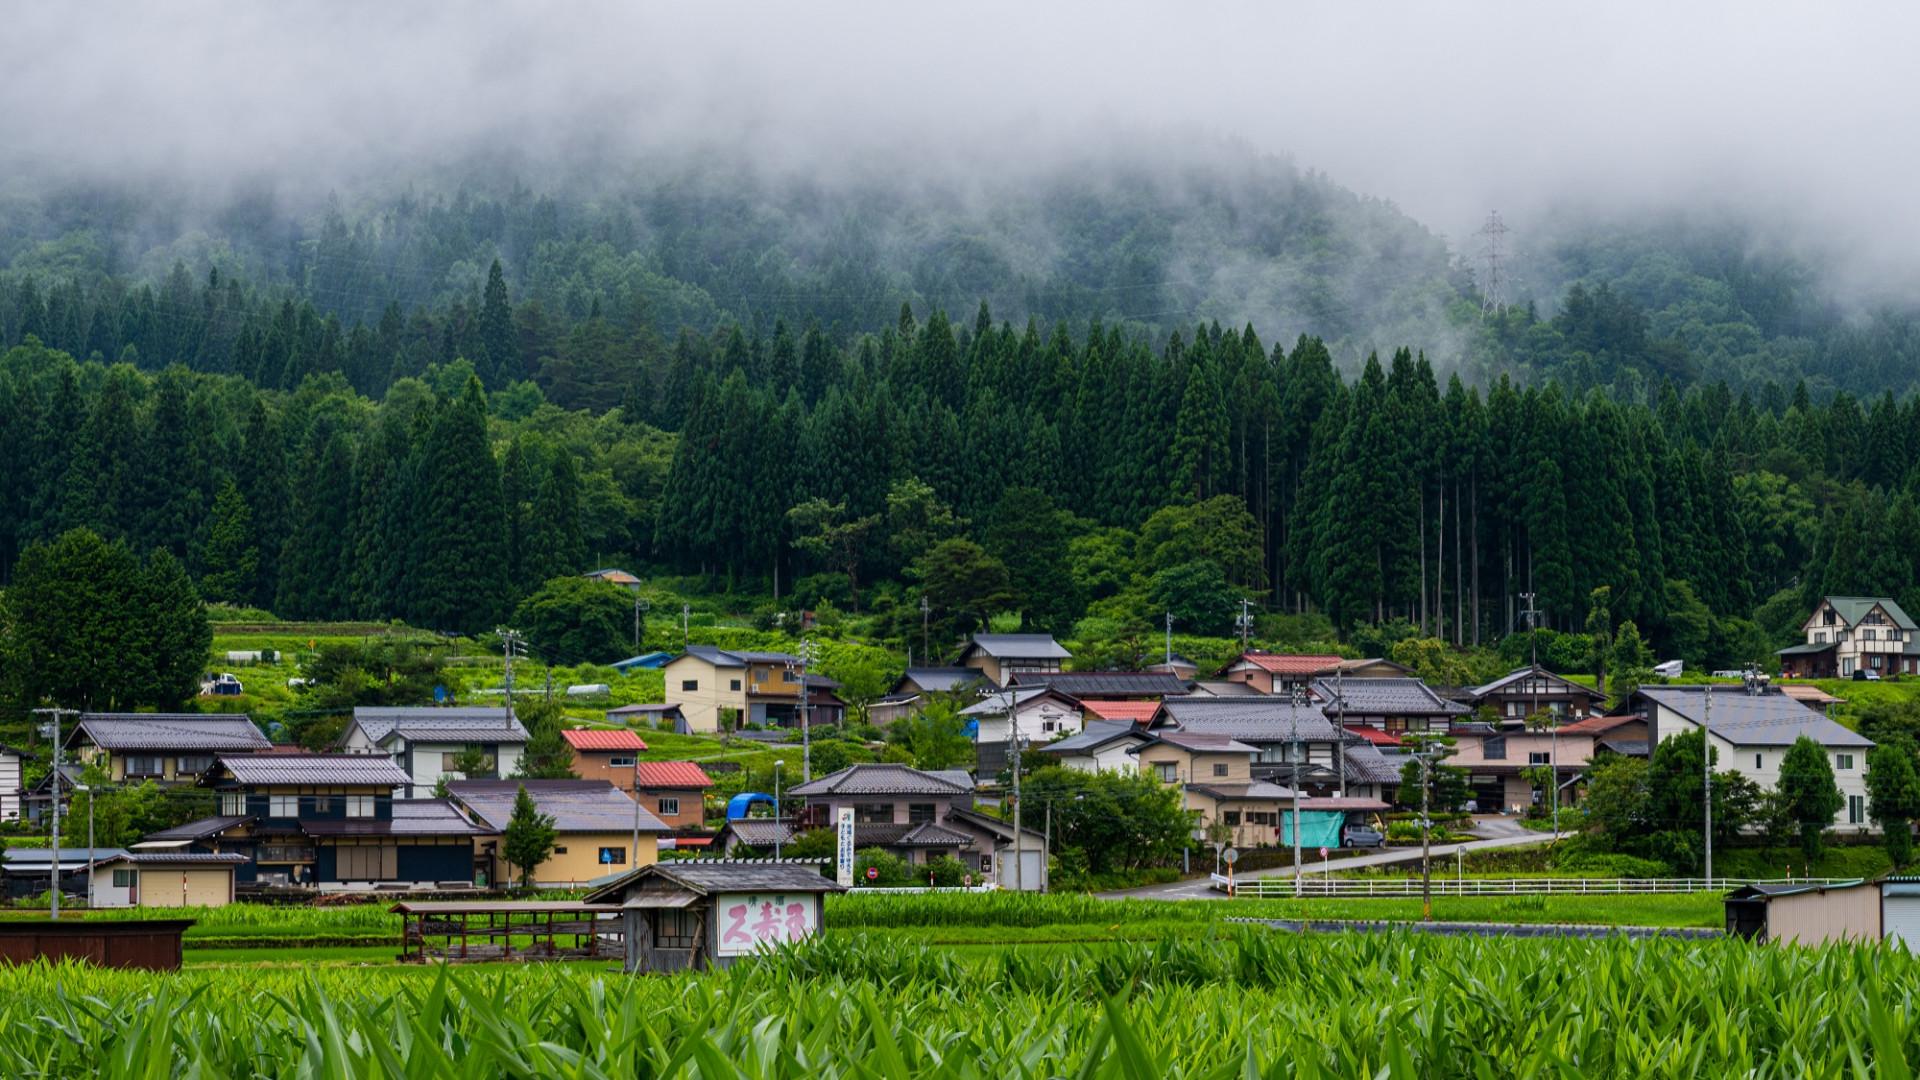 Experience Hida's Scenic Nature